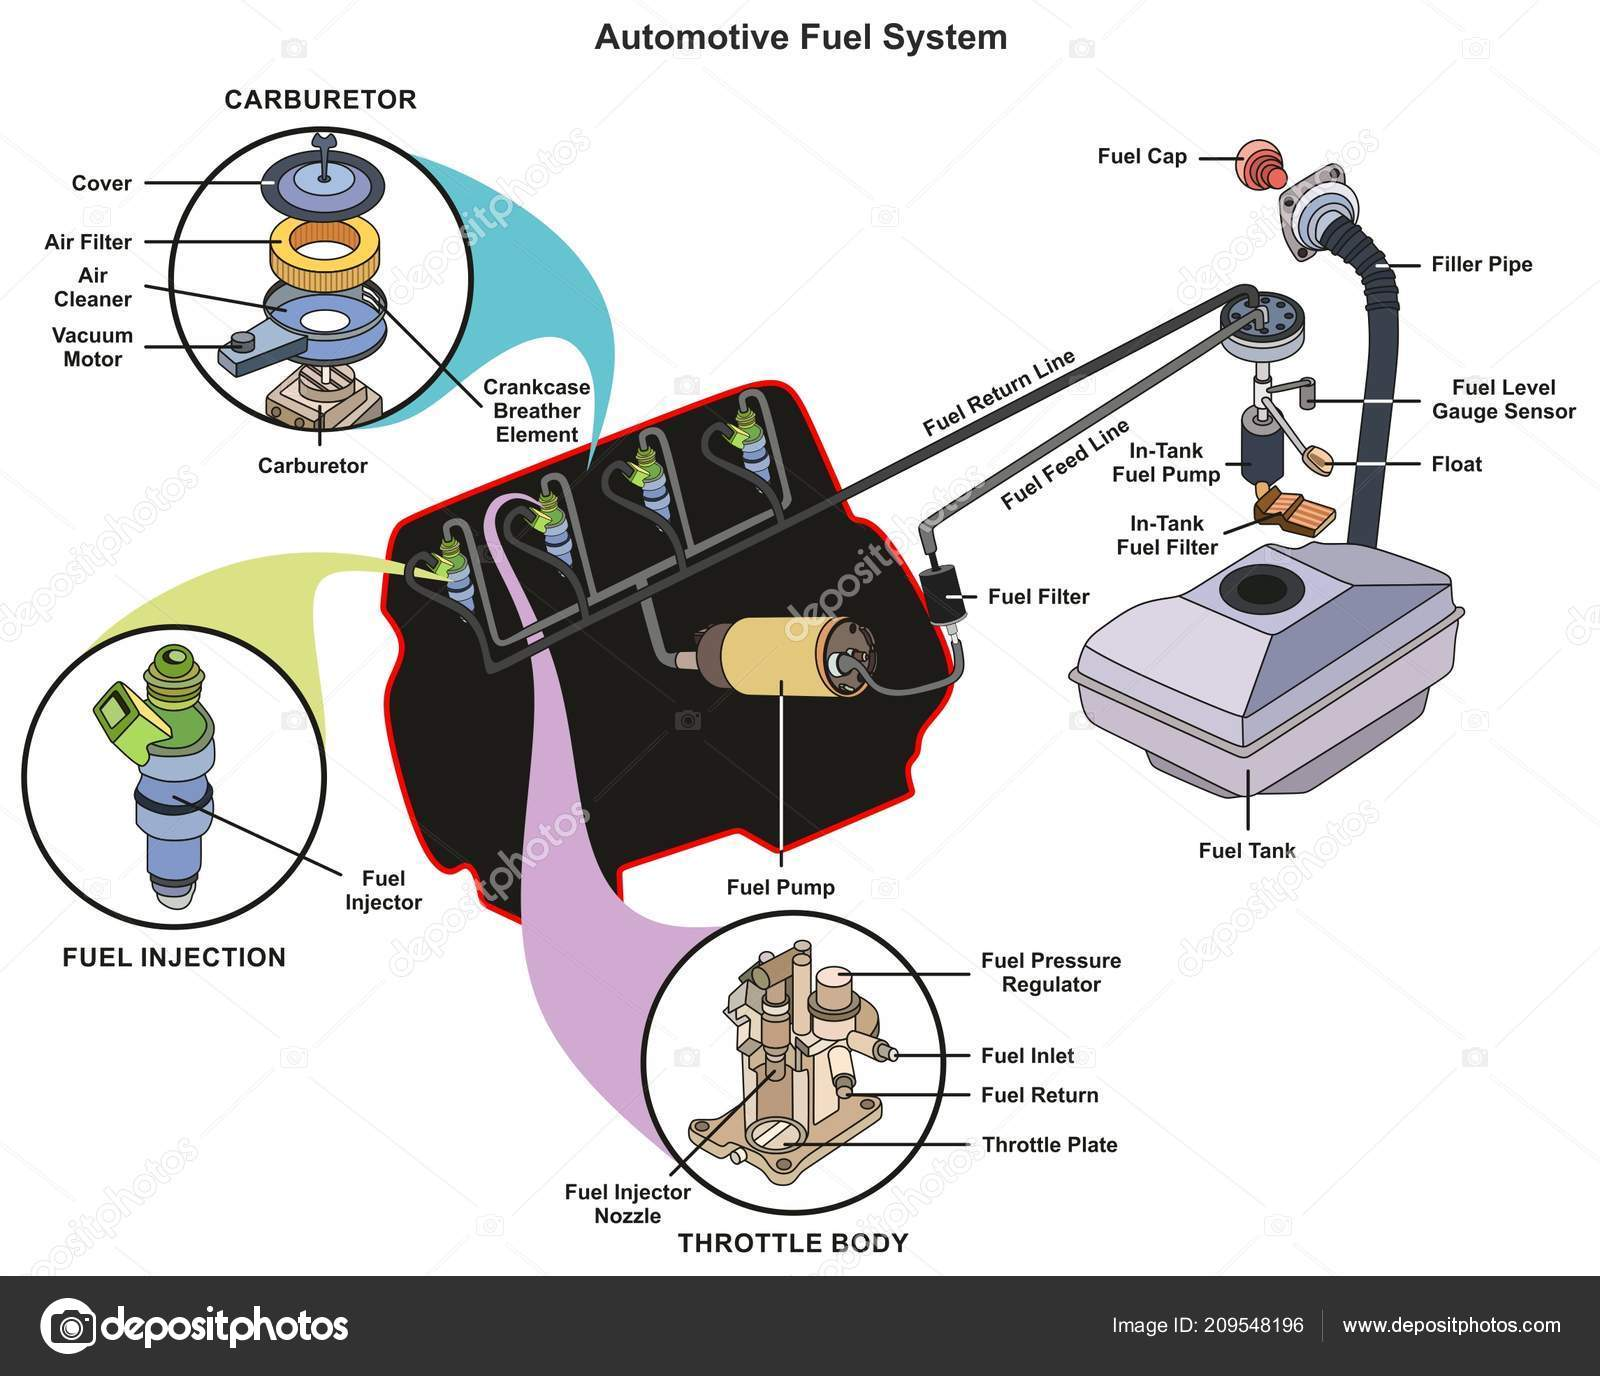 hight resolution of car fuel tank diagram wiring diagram dat race car fuel system diagram car fuel tank diagram